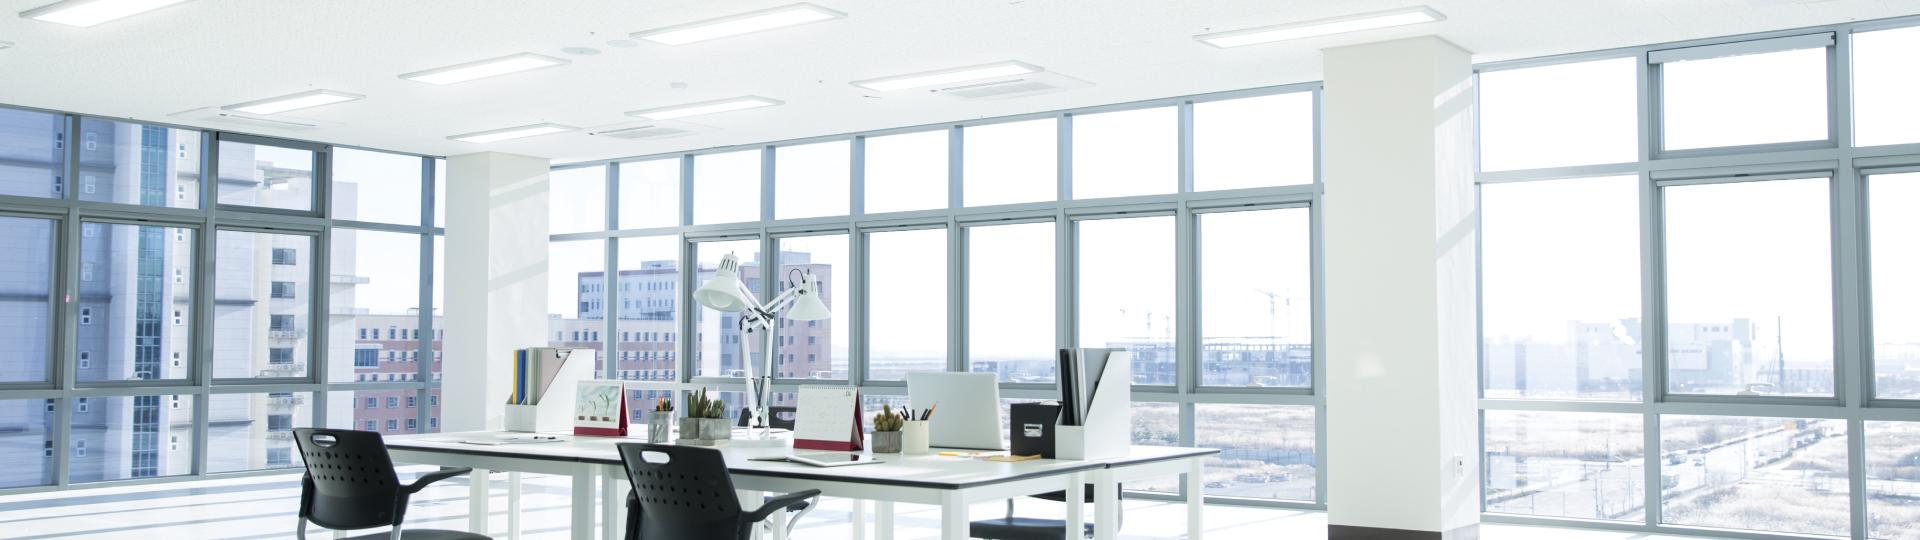 J&Kテック株式会社|デザイン照明、住宅用照明、オフィス照明、店舗用照明